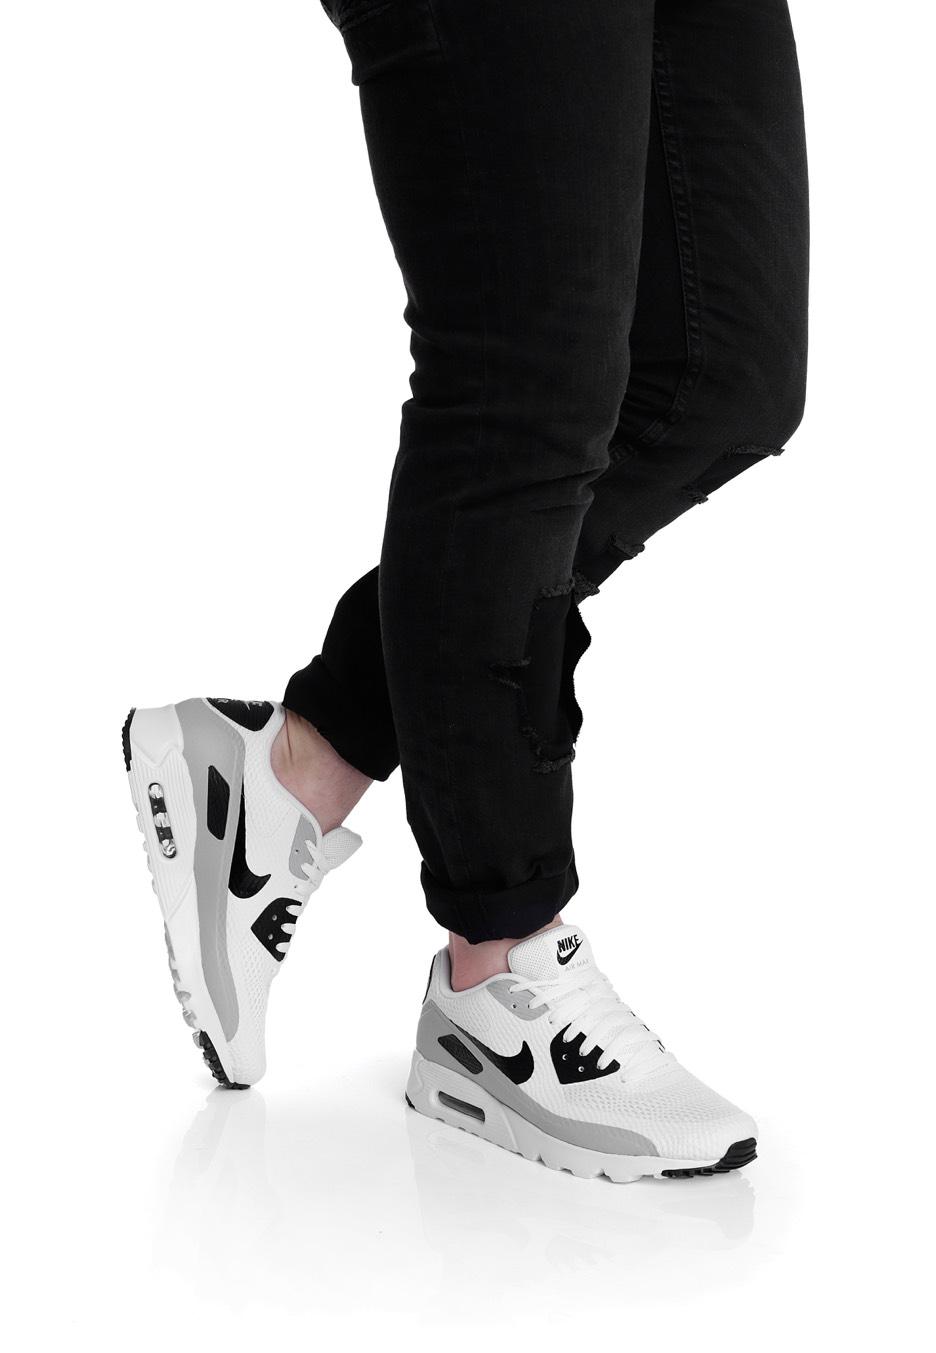 pretty nice e7634 80dd6 ... Nike - Air Max 90 Ultra Essential White Black Wolf Grey - Shoes